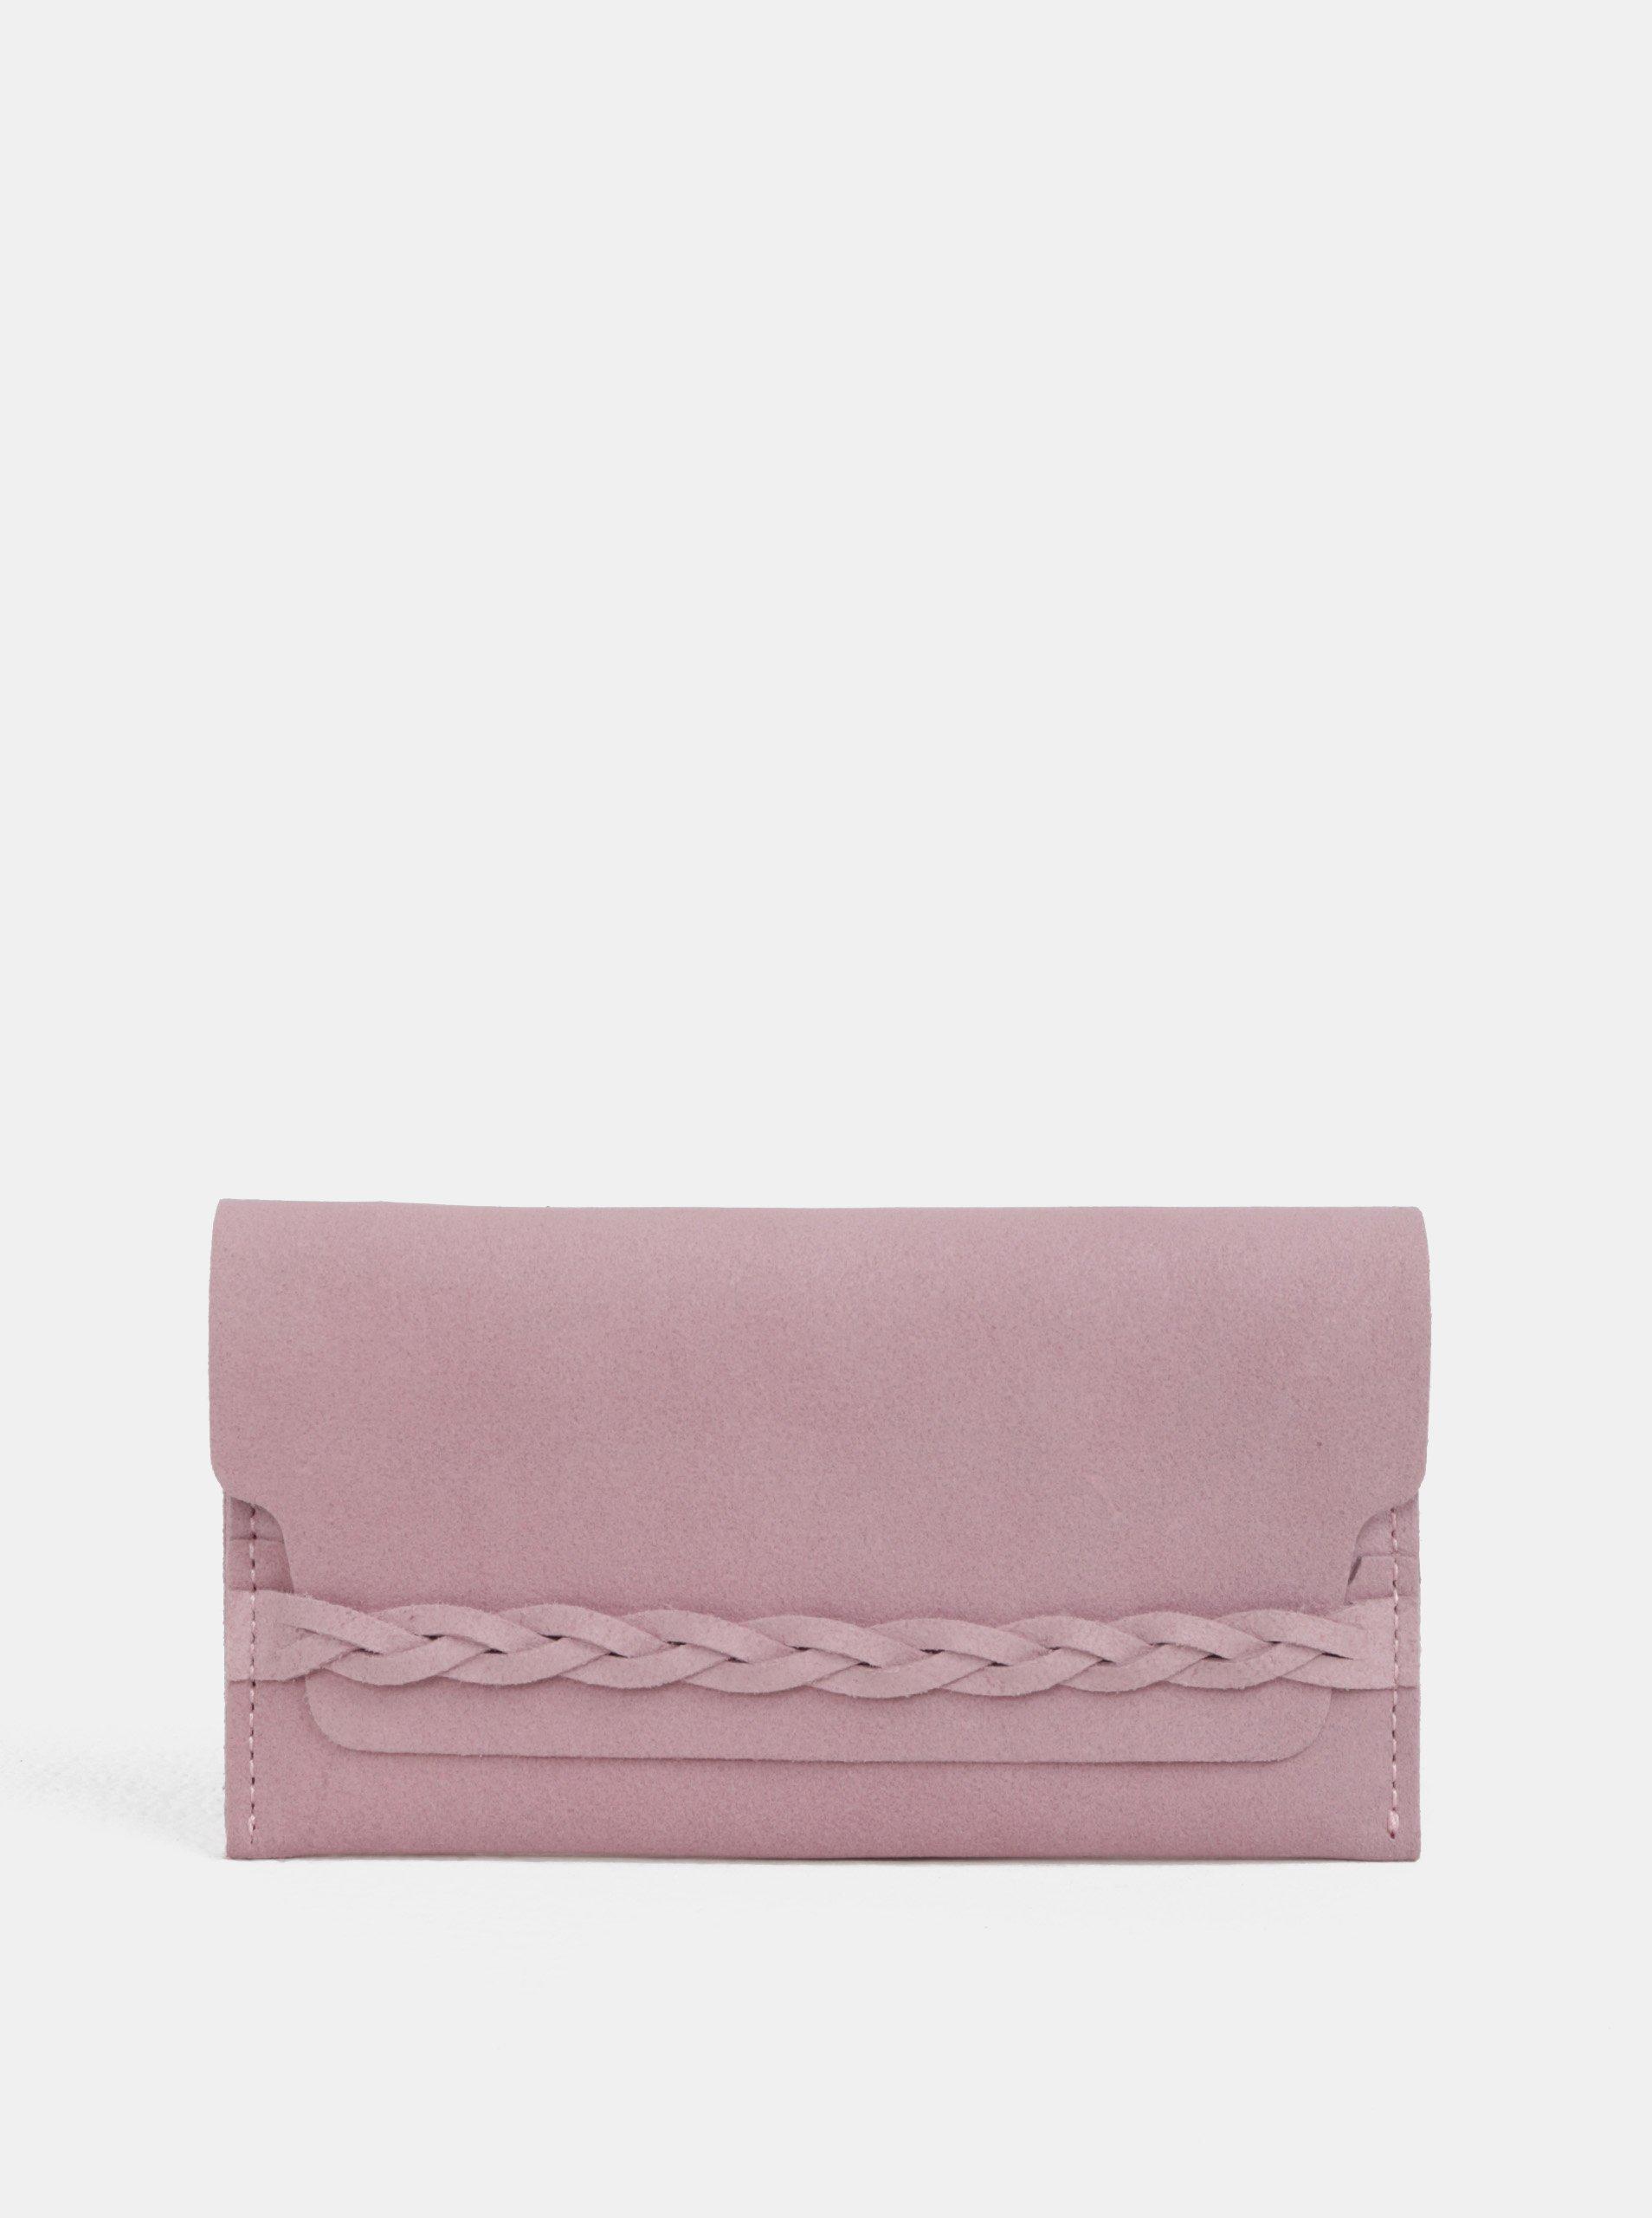 Růžová kožená peněženka WOOX Moneta Efferta Rosea